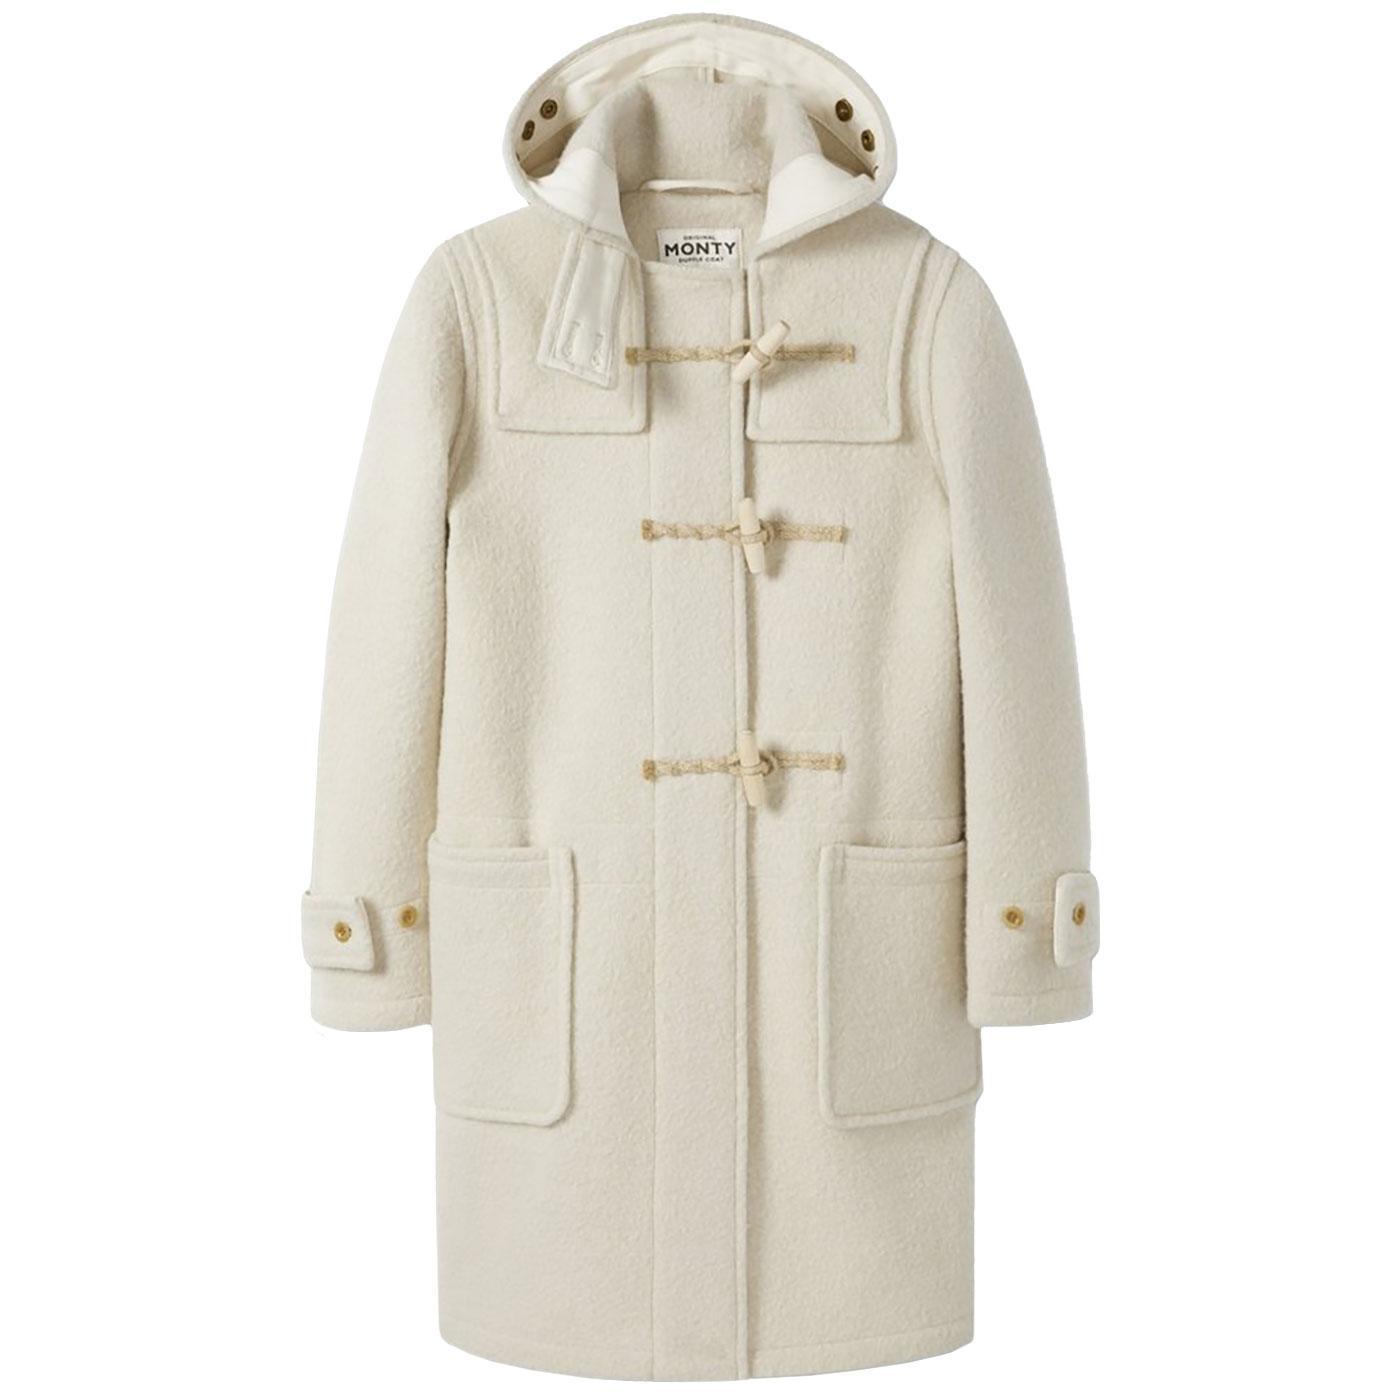 GLOVERALL Women's Retro Original Monty Duffle Coat